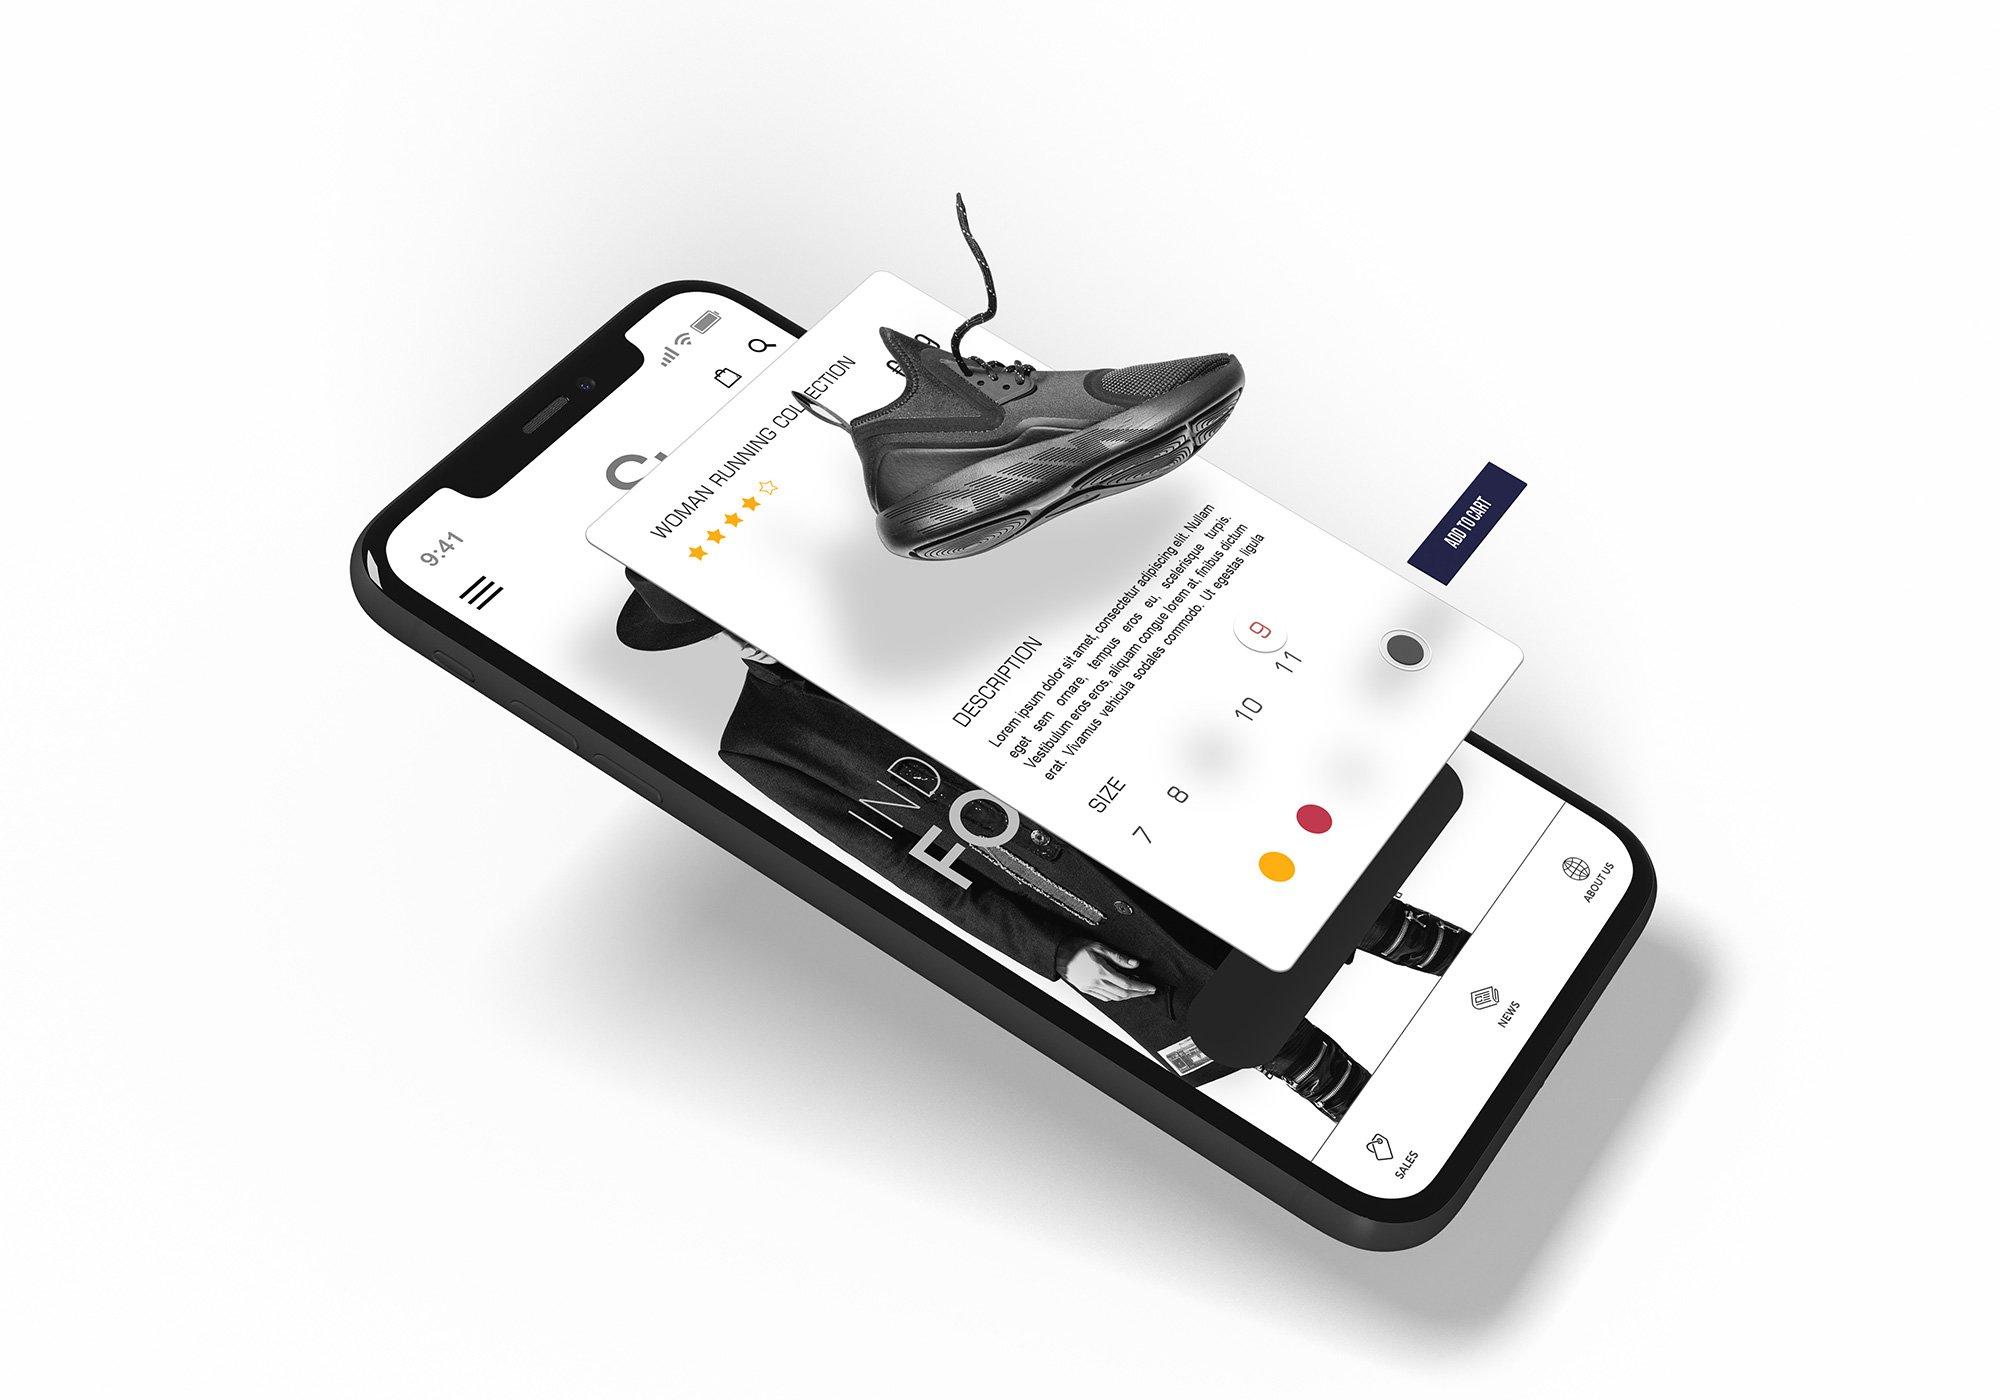 APP应用设计iPhone X屏幕演示样机模板 iPhone X Multilayer Mockup Set插图(7)